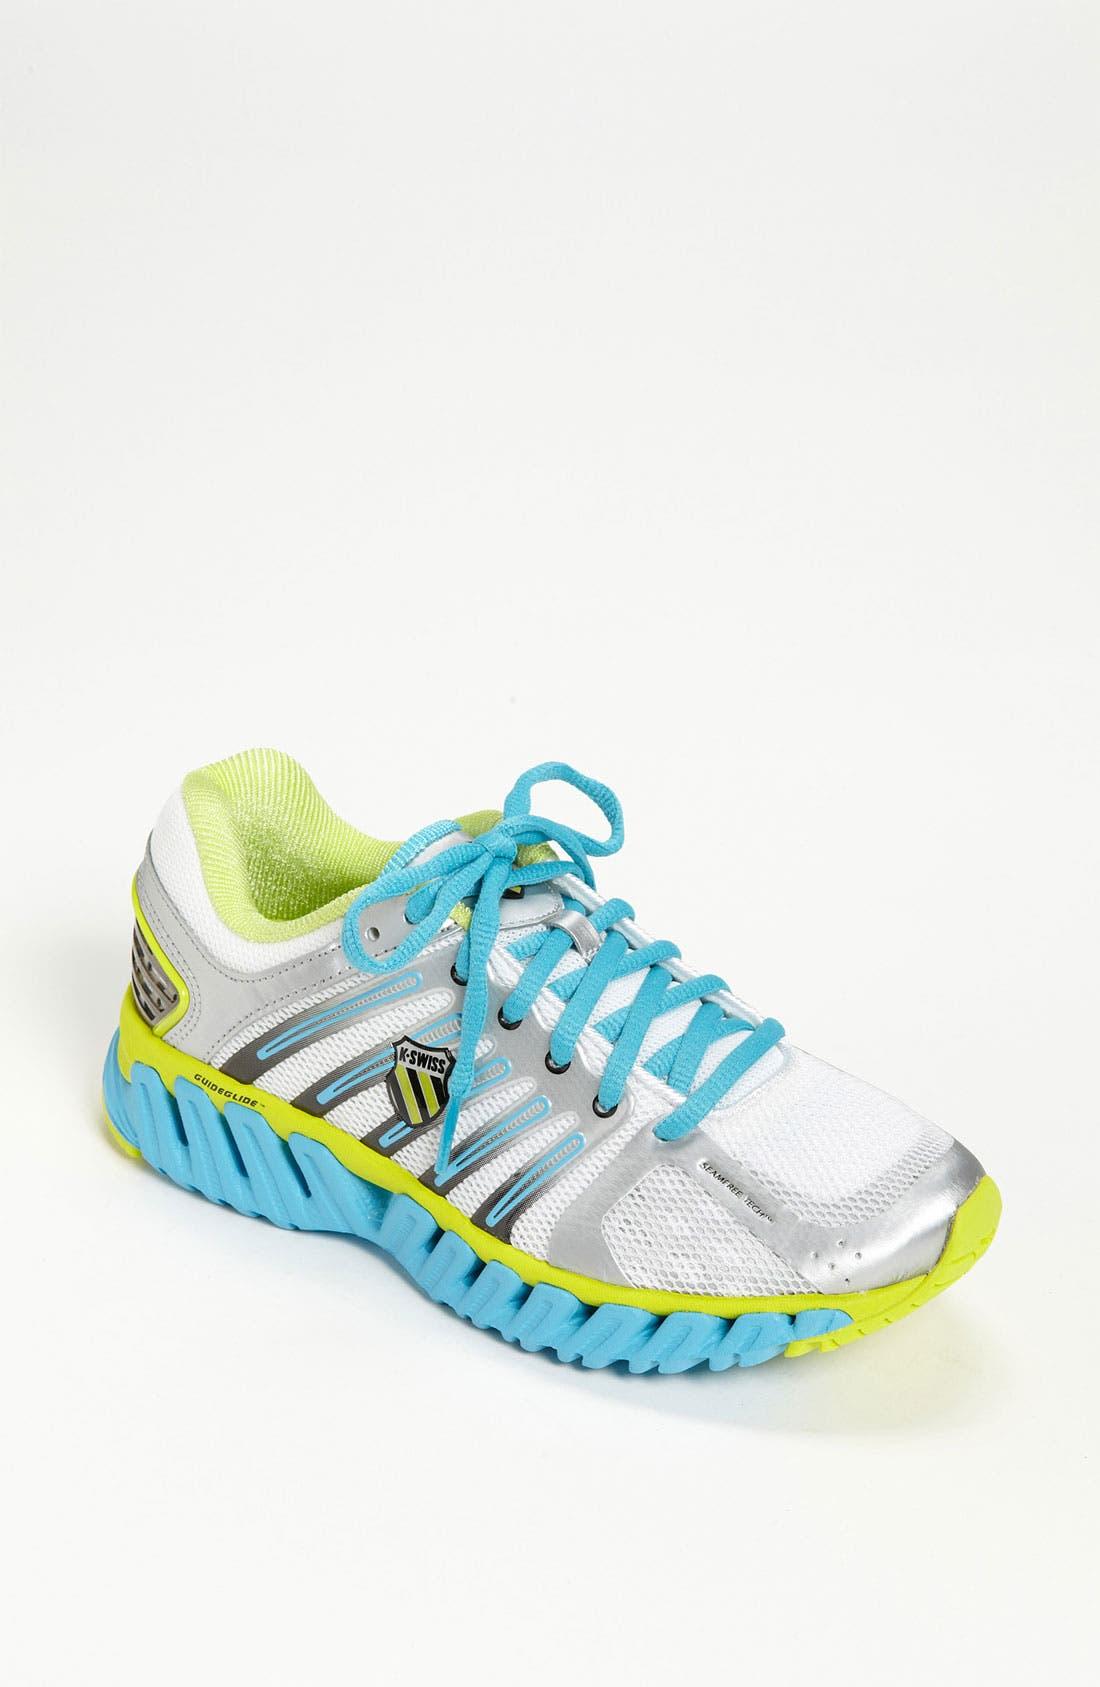 Alternate Image 1 Selected - K-Swiss 'Blade Max' Training Shoe (Women)